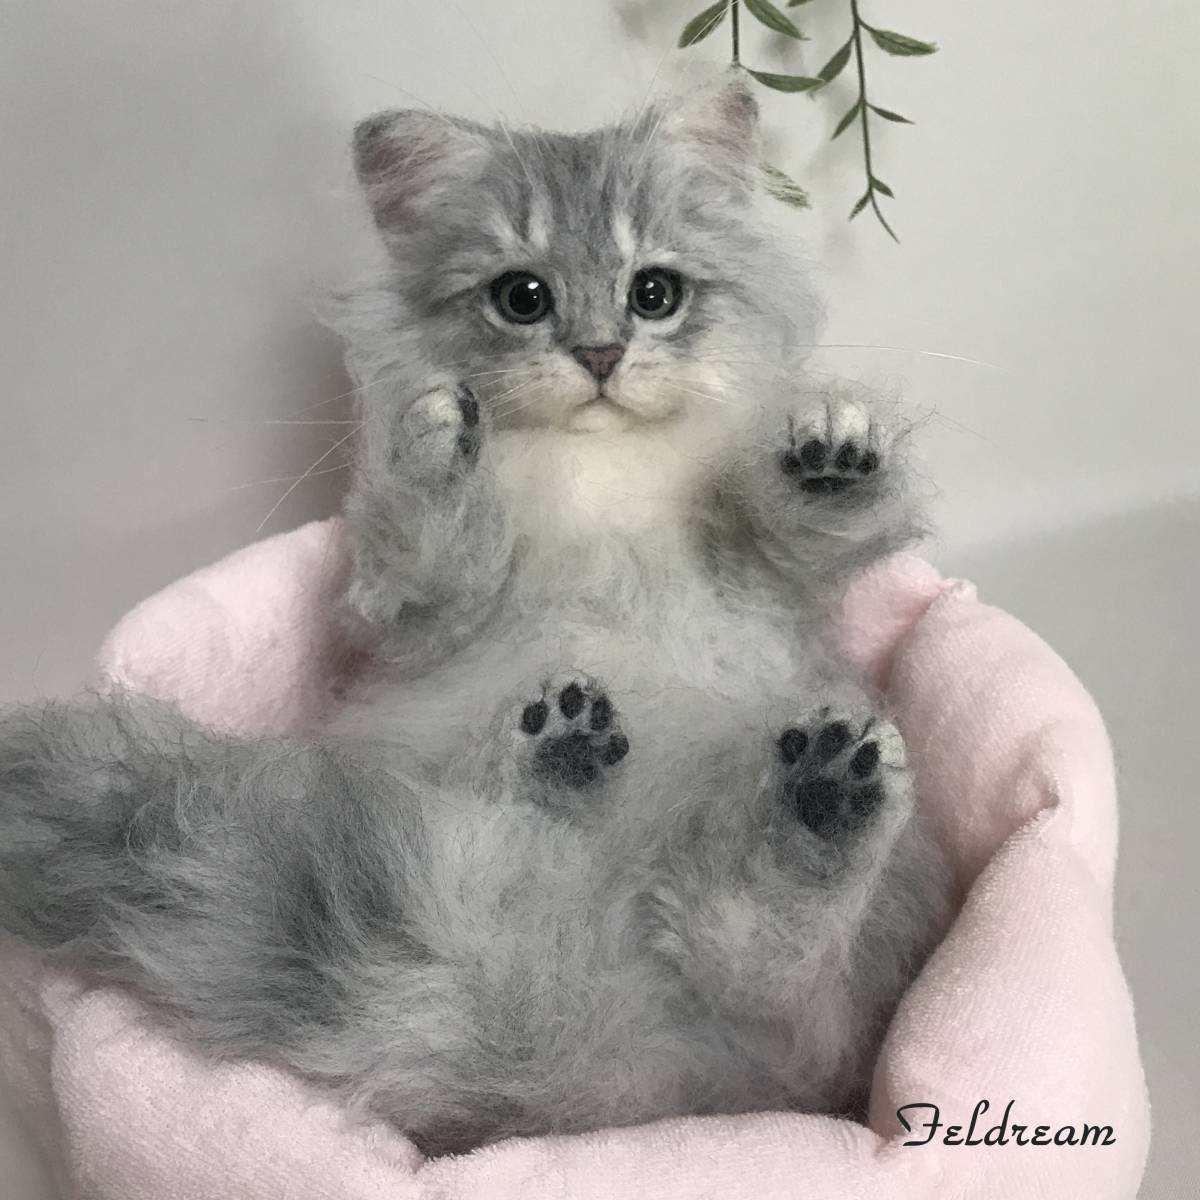 Feldream◆羊毛フェルト猫 寝転ぶチンチラシルバー子猫ちゃん ベッド付き ≪実物大≫  ペルシャ ハンドメイド